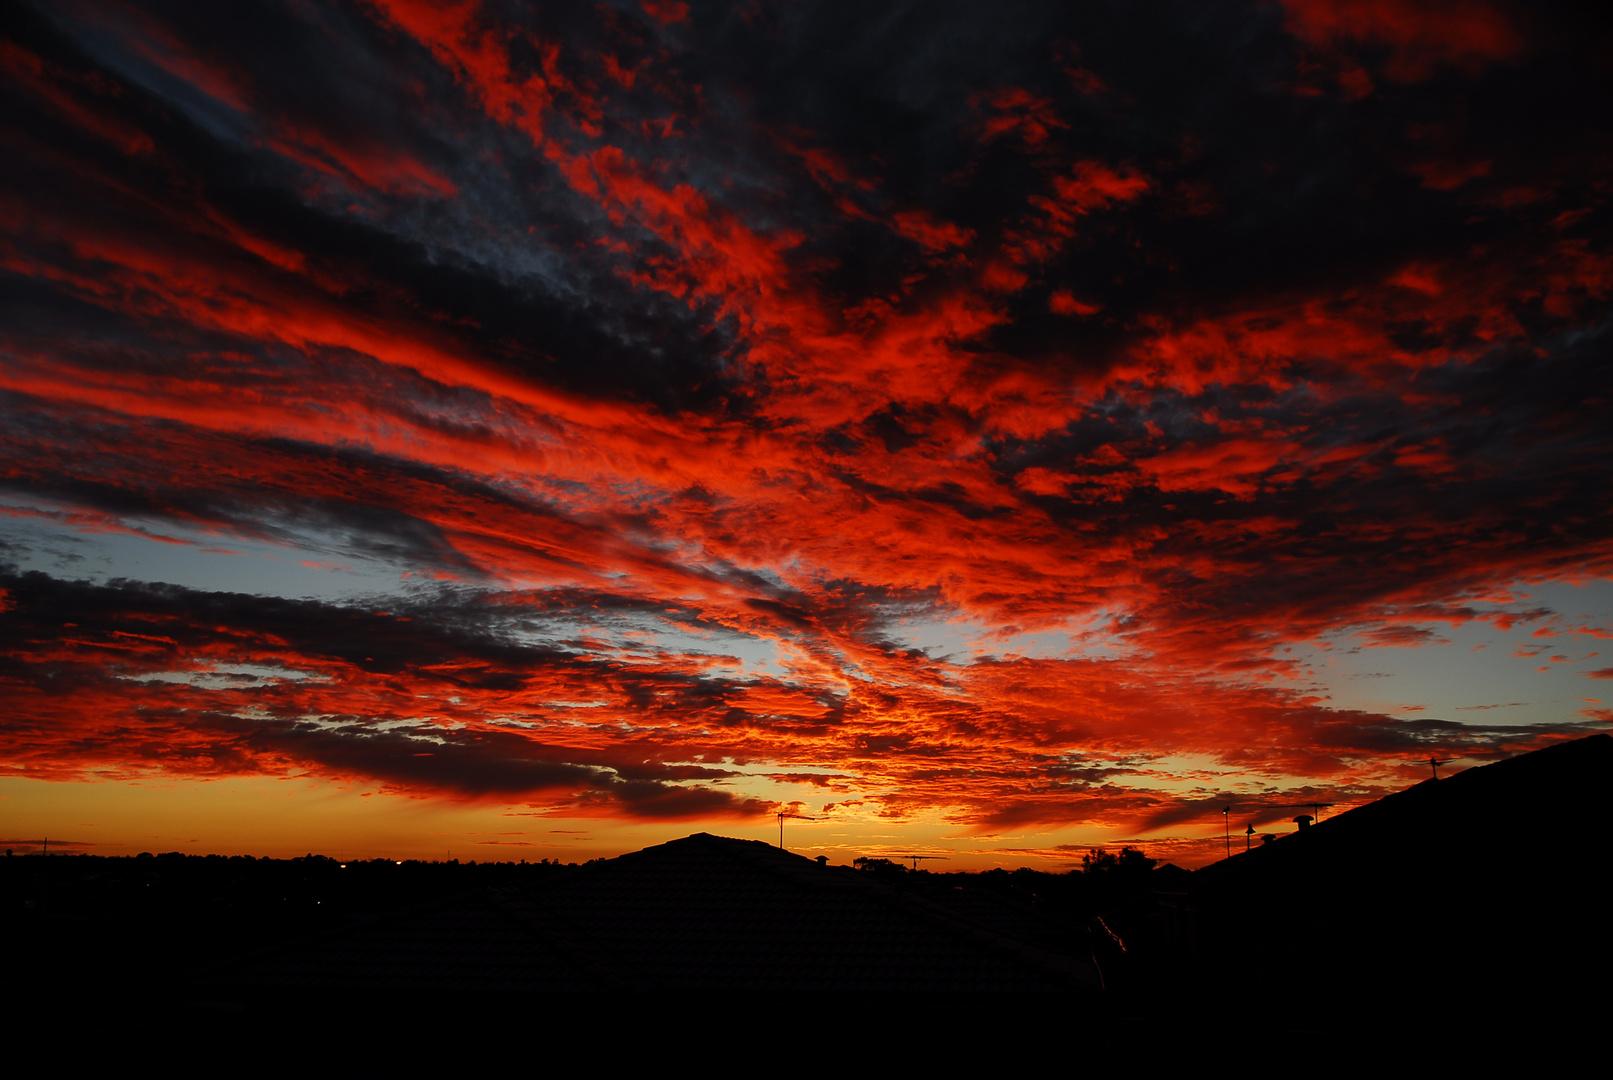 Sunrise Western Australia, Clarkson north Perth